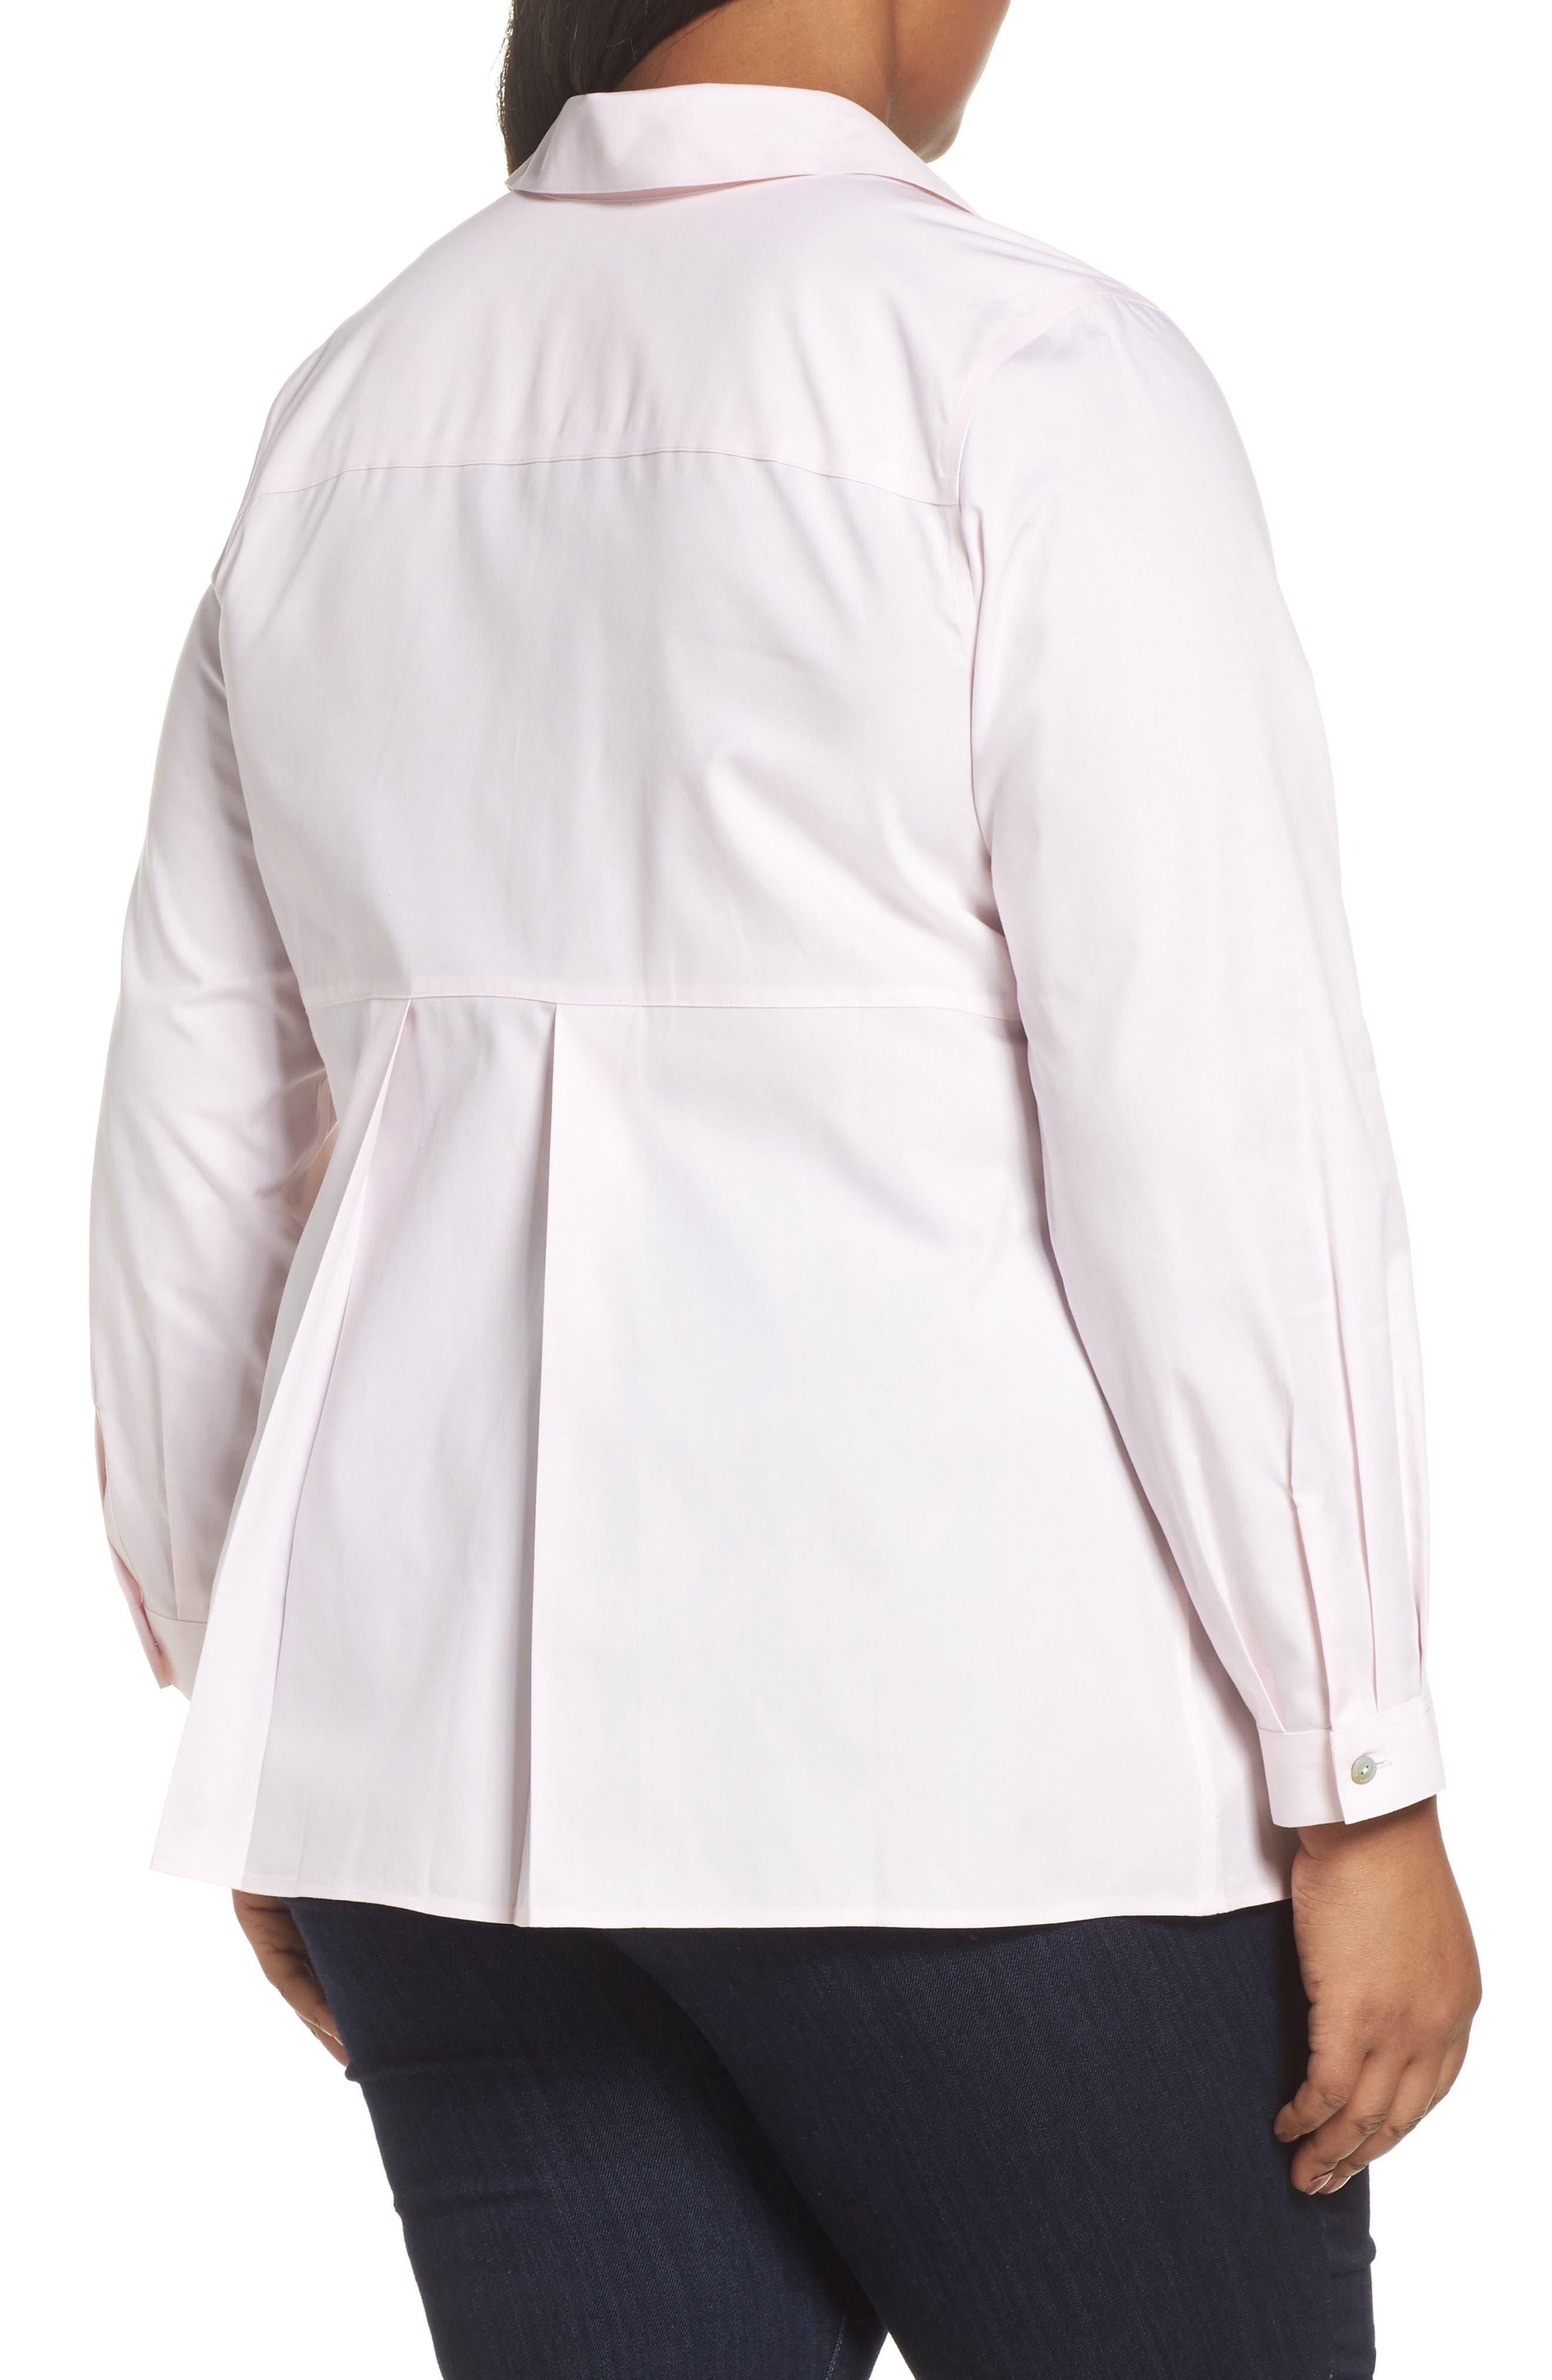 Pinpoint Oxford Cloth Shirt,                             Alternate thumbnail 6, color,